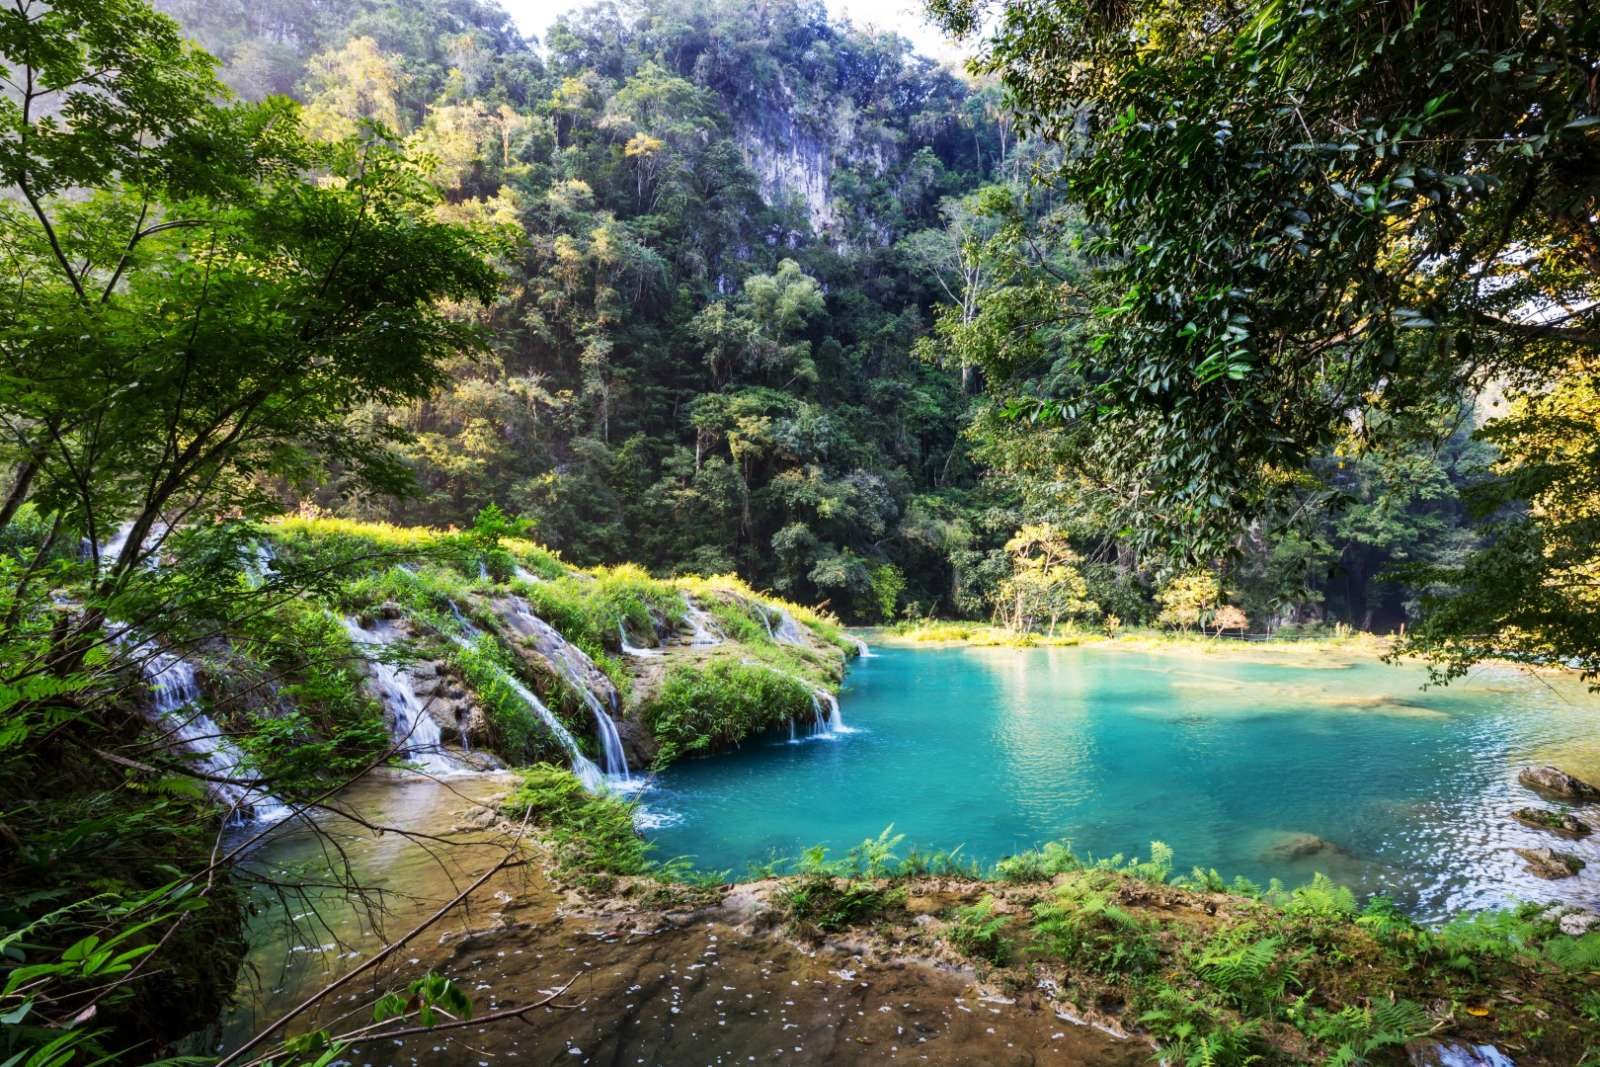 Cascades at Semuc Champey in Guatemala